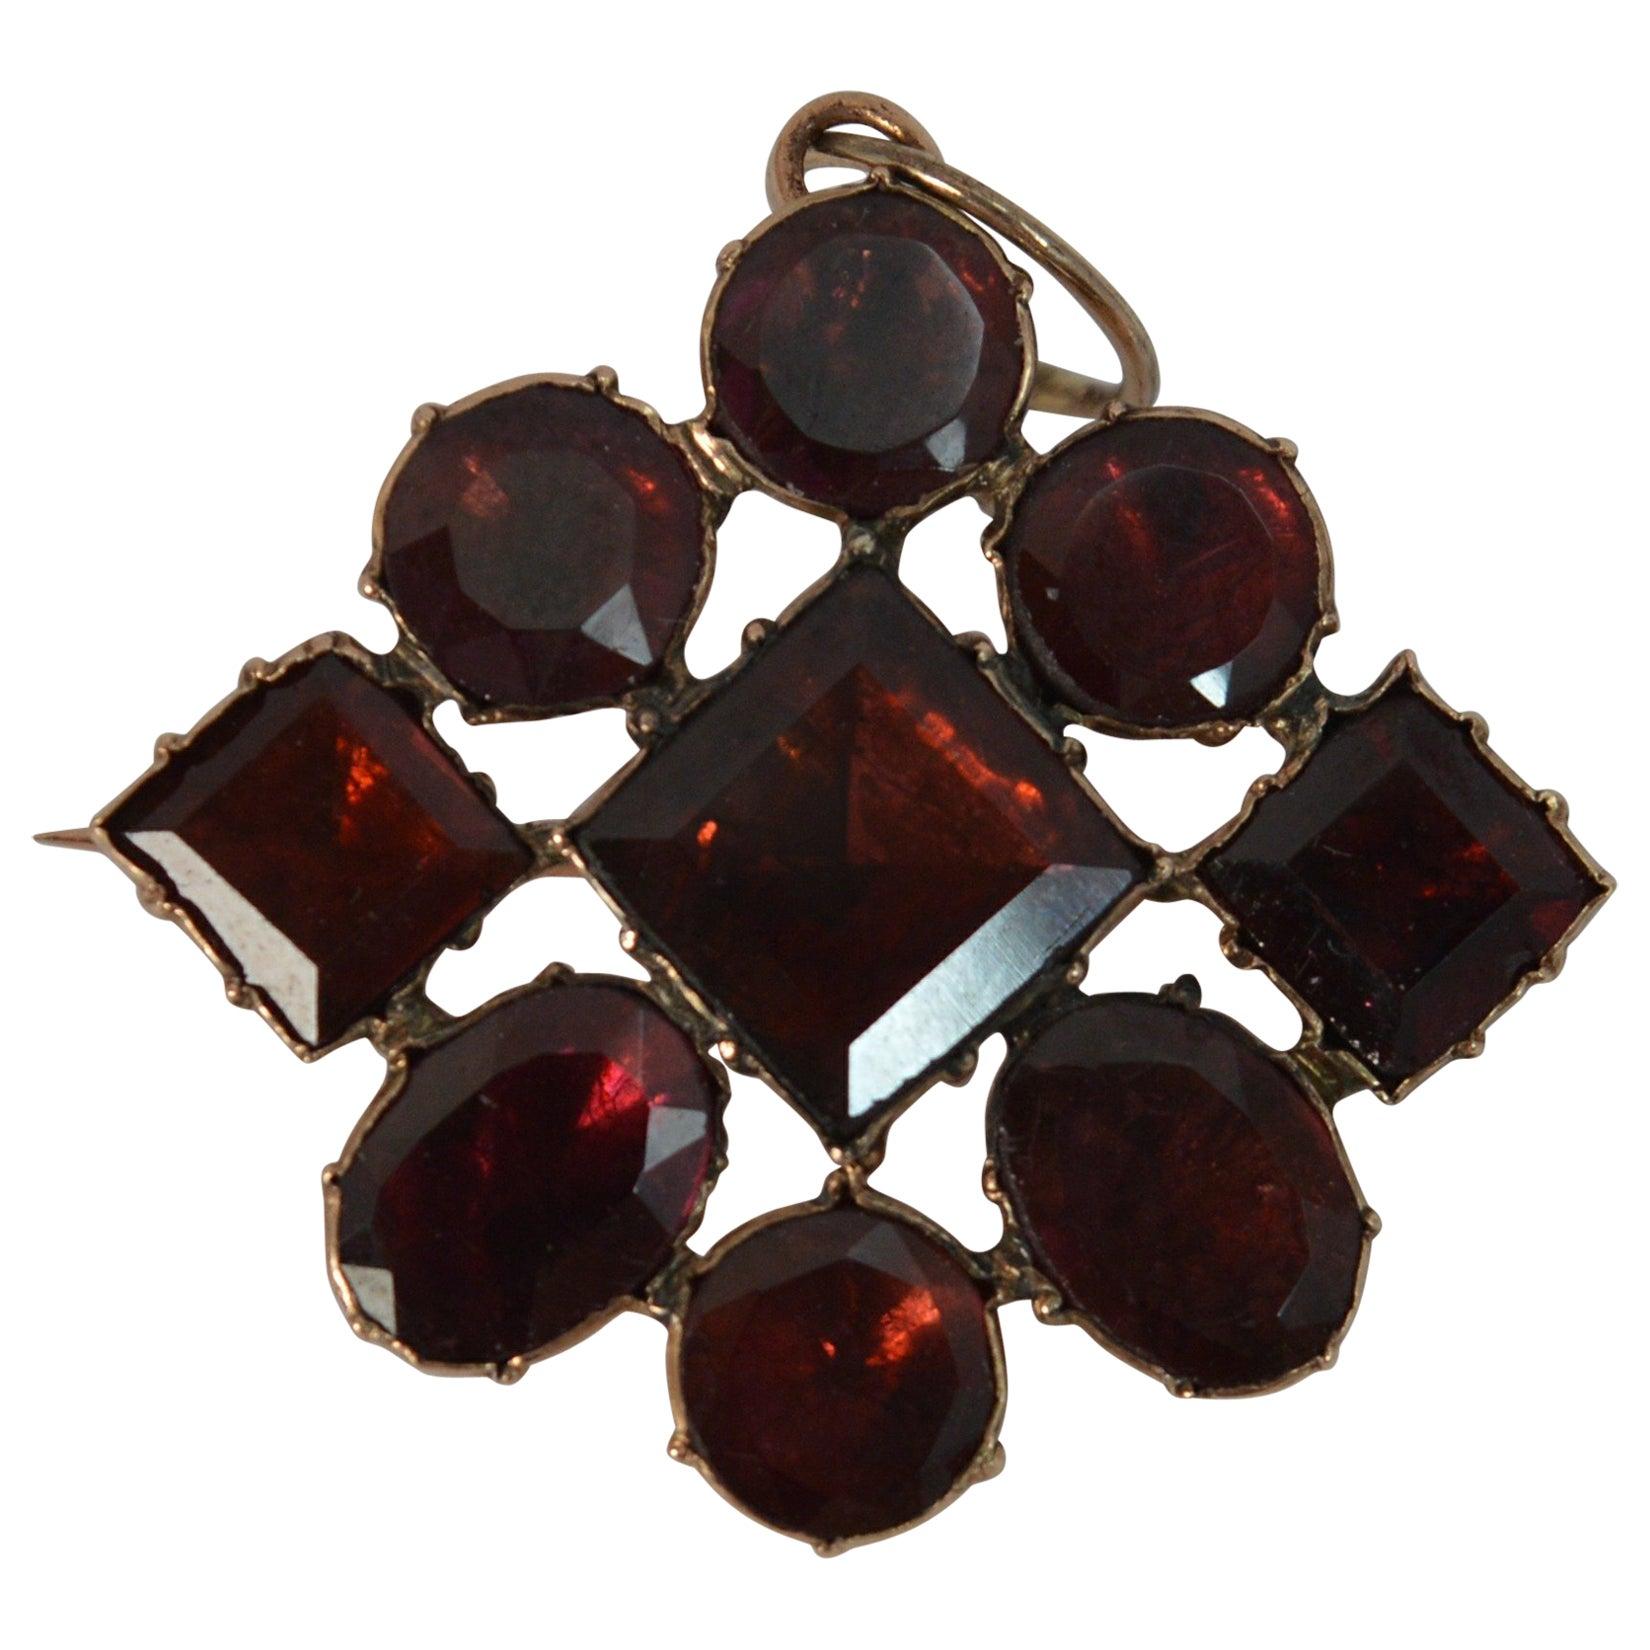 Georgian 9 Carat Rose Gold and Closed Foiled Back Garnet Brooch and Pendant